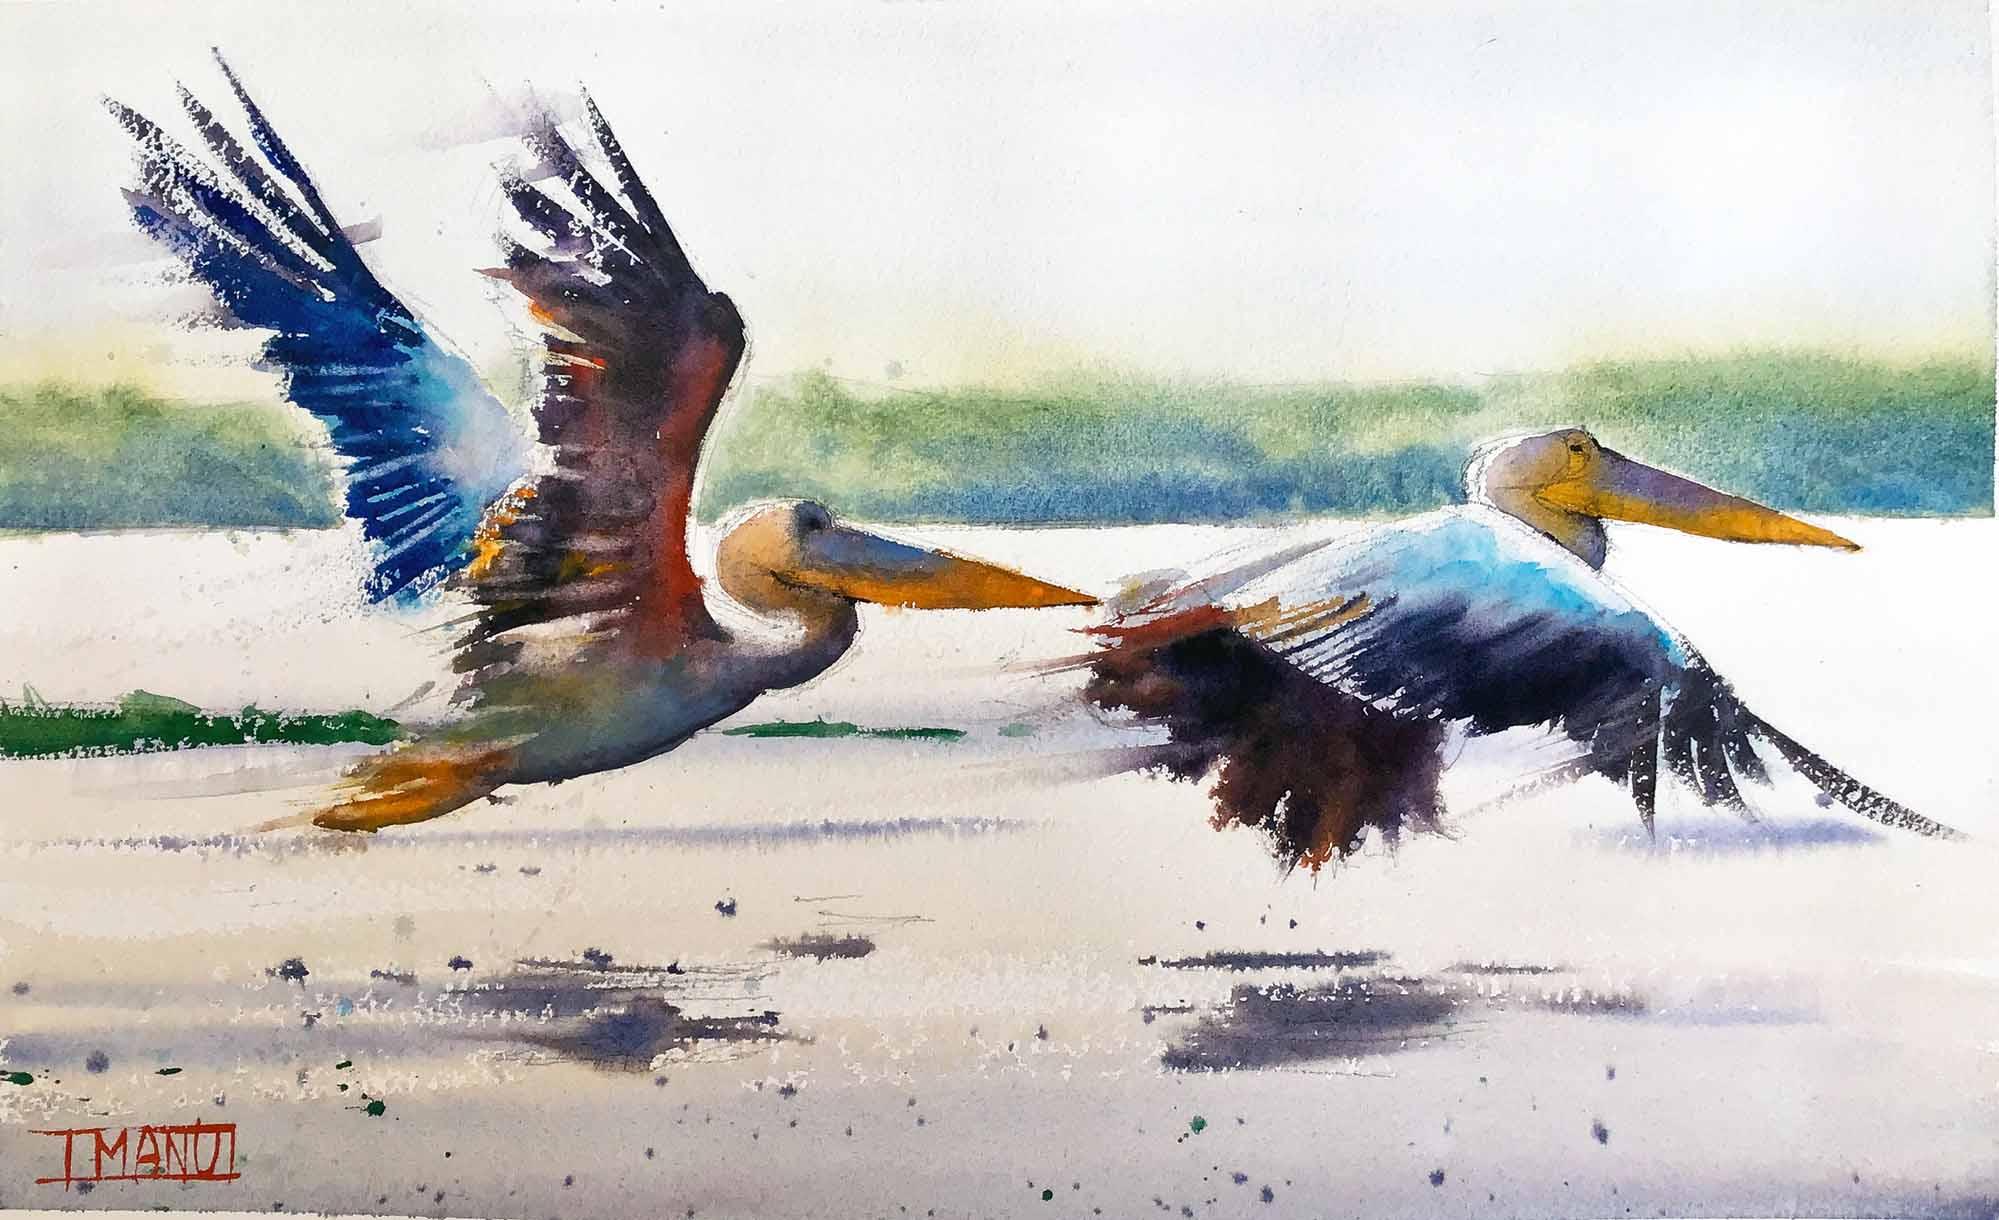 Pelicans emmanuele cammarano fine artist watercolorist acquerellista